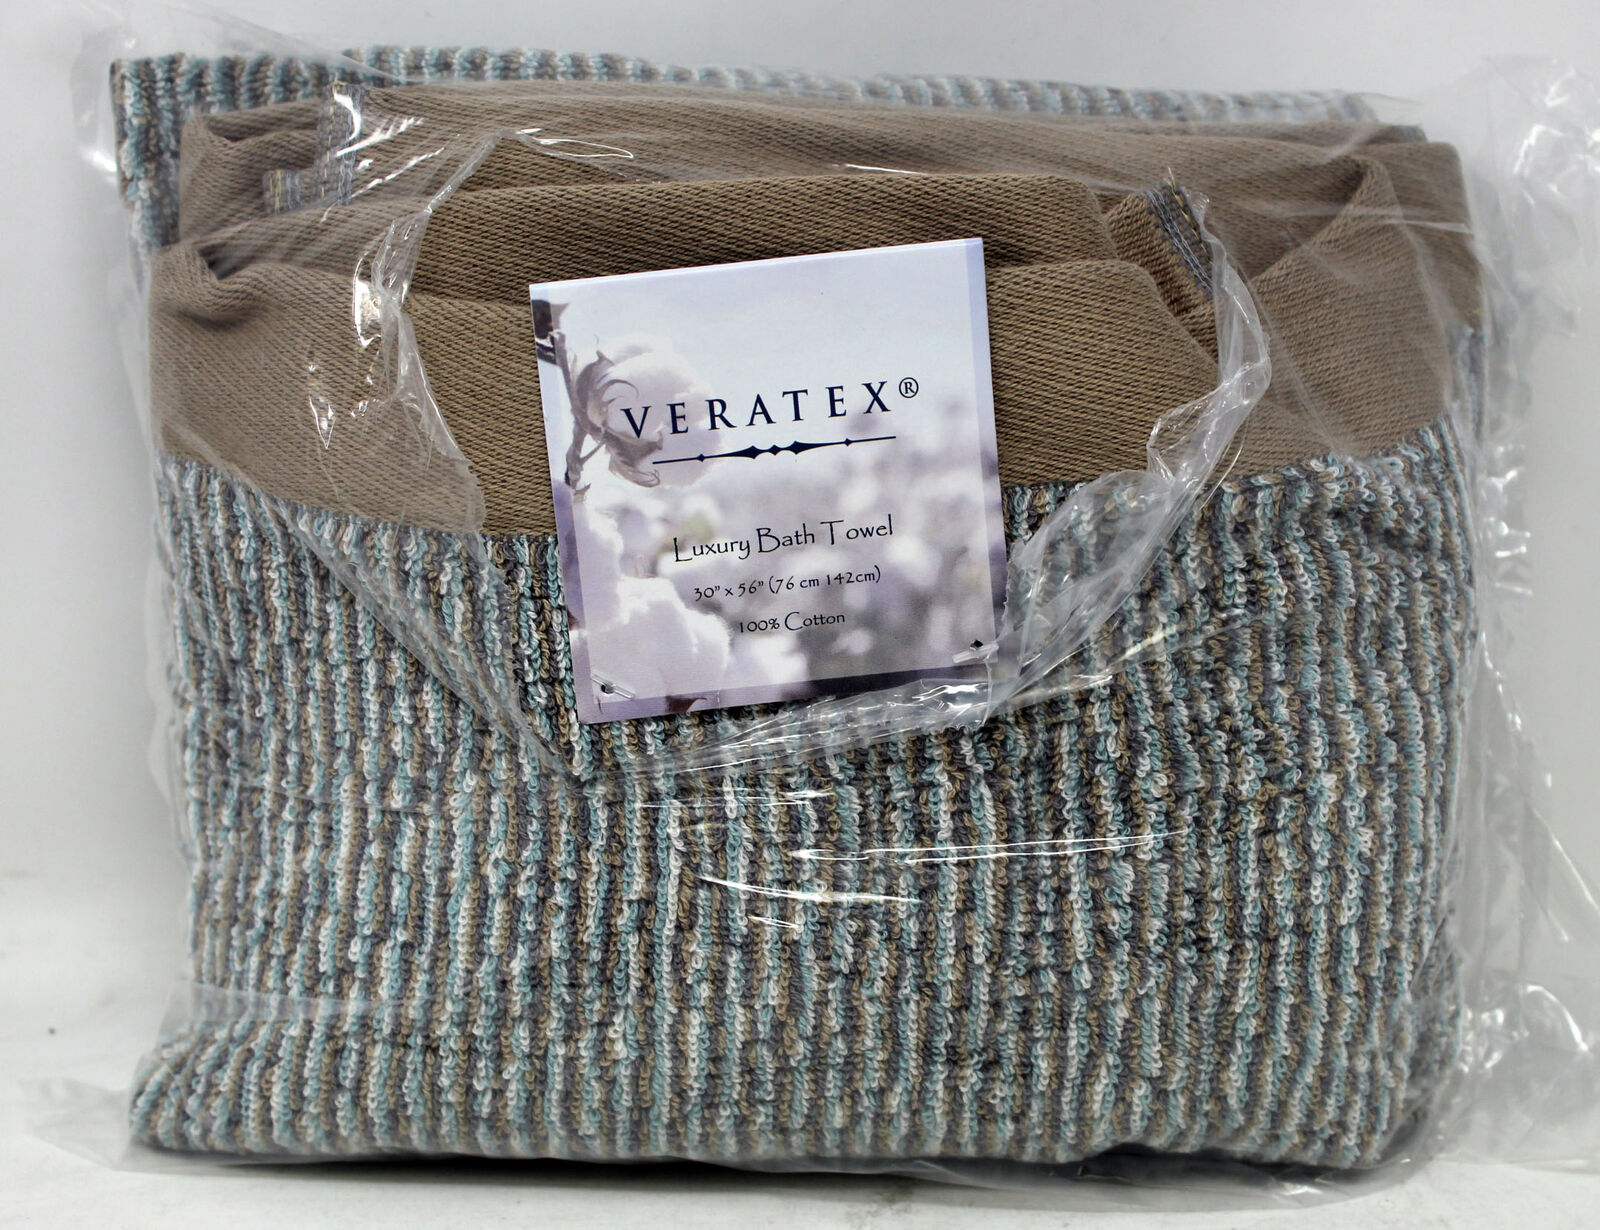 Veratex 100% Cotton Luxury Bath Towel Flaxen - Natural 1 Count